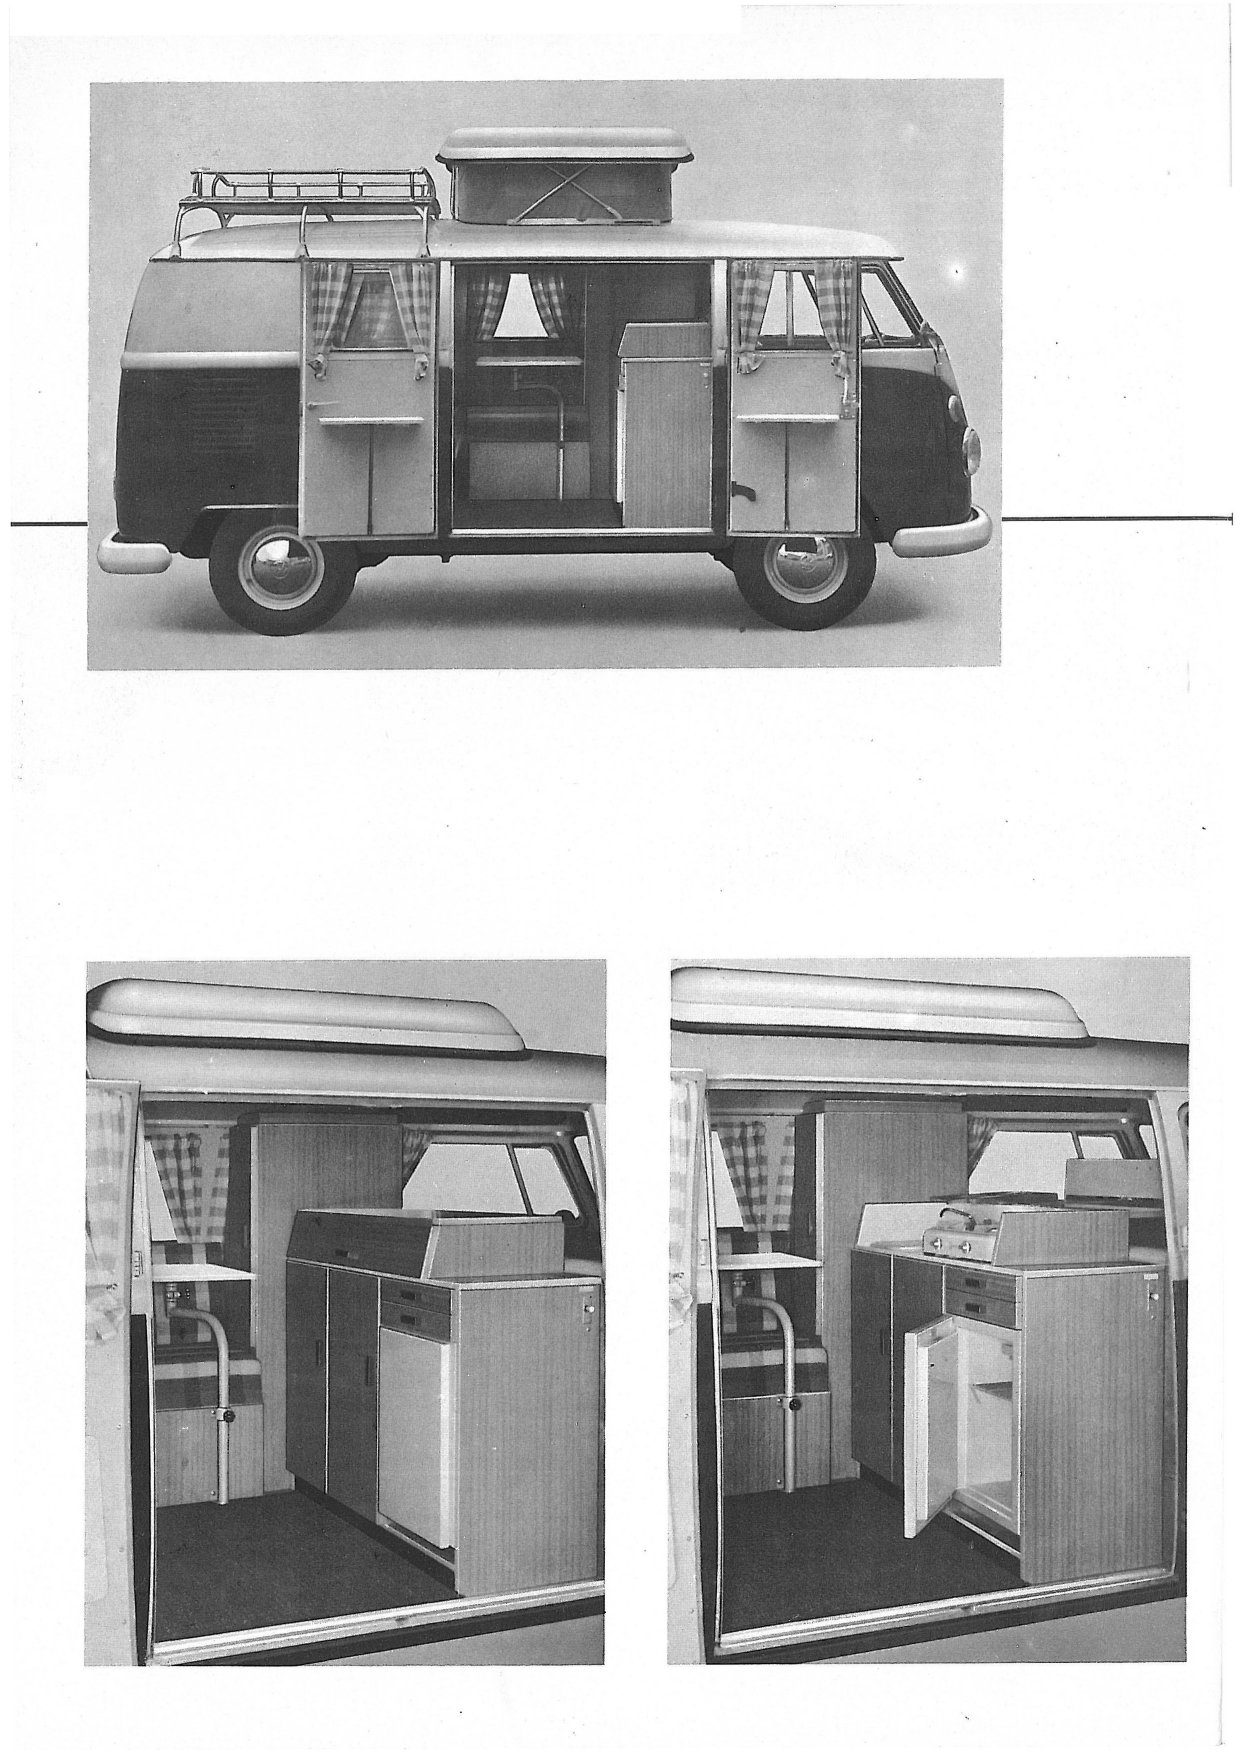 Thesamba Com Vw Archives 1967 Westfalia So44 Camper